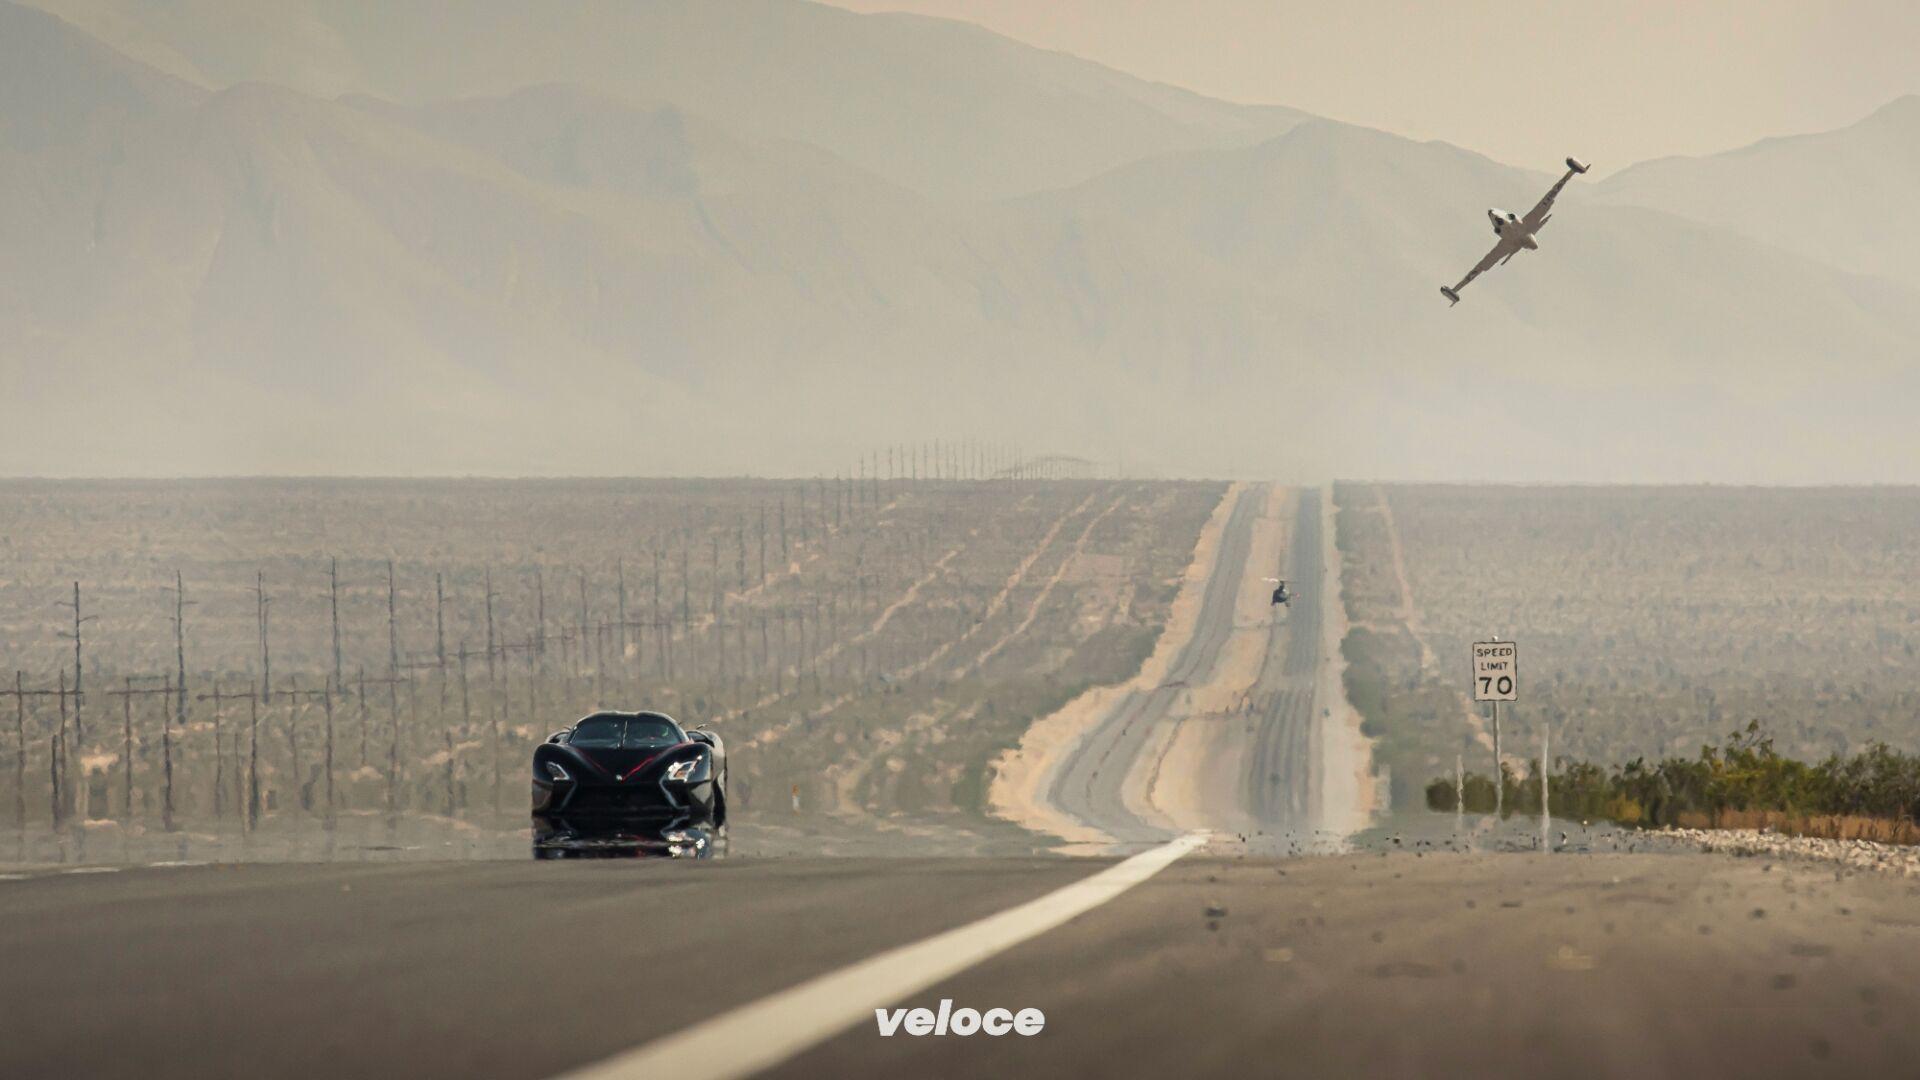 Shelby SSC Tuatara 2020 SSC-Tuatara-record-di-velocità-533-kmh-14-1920x1080